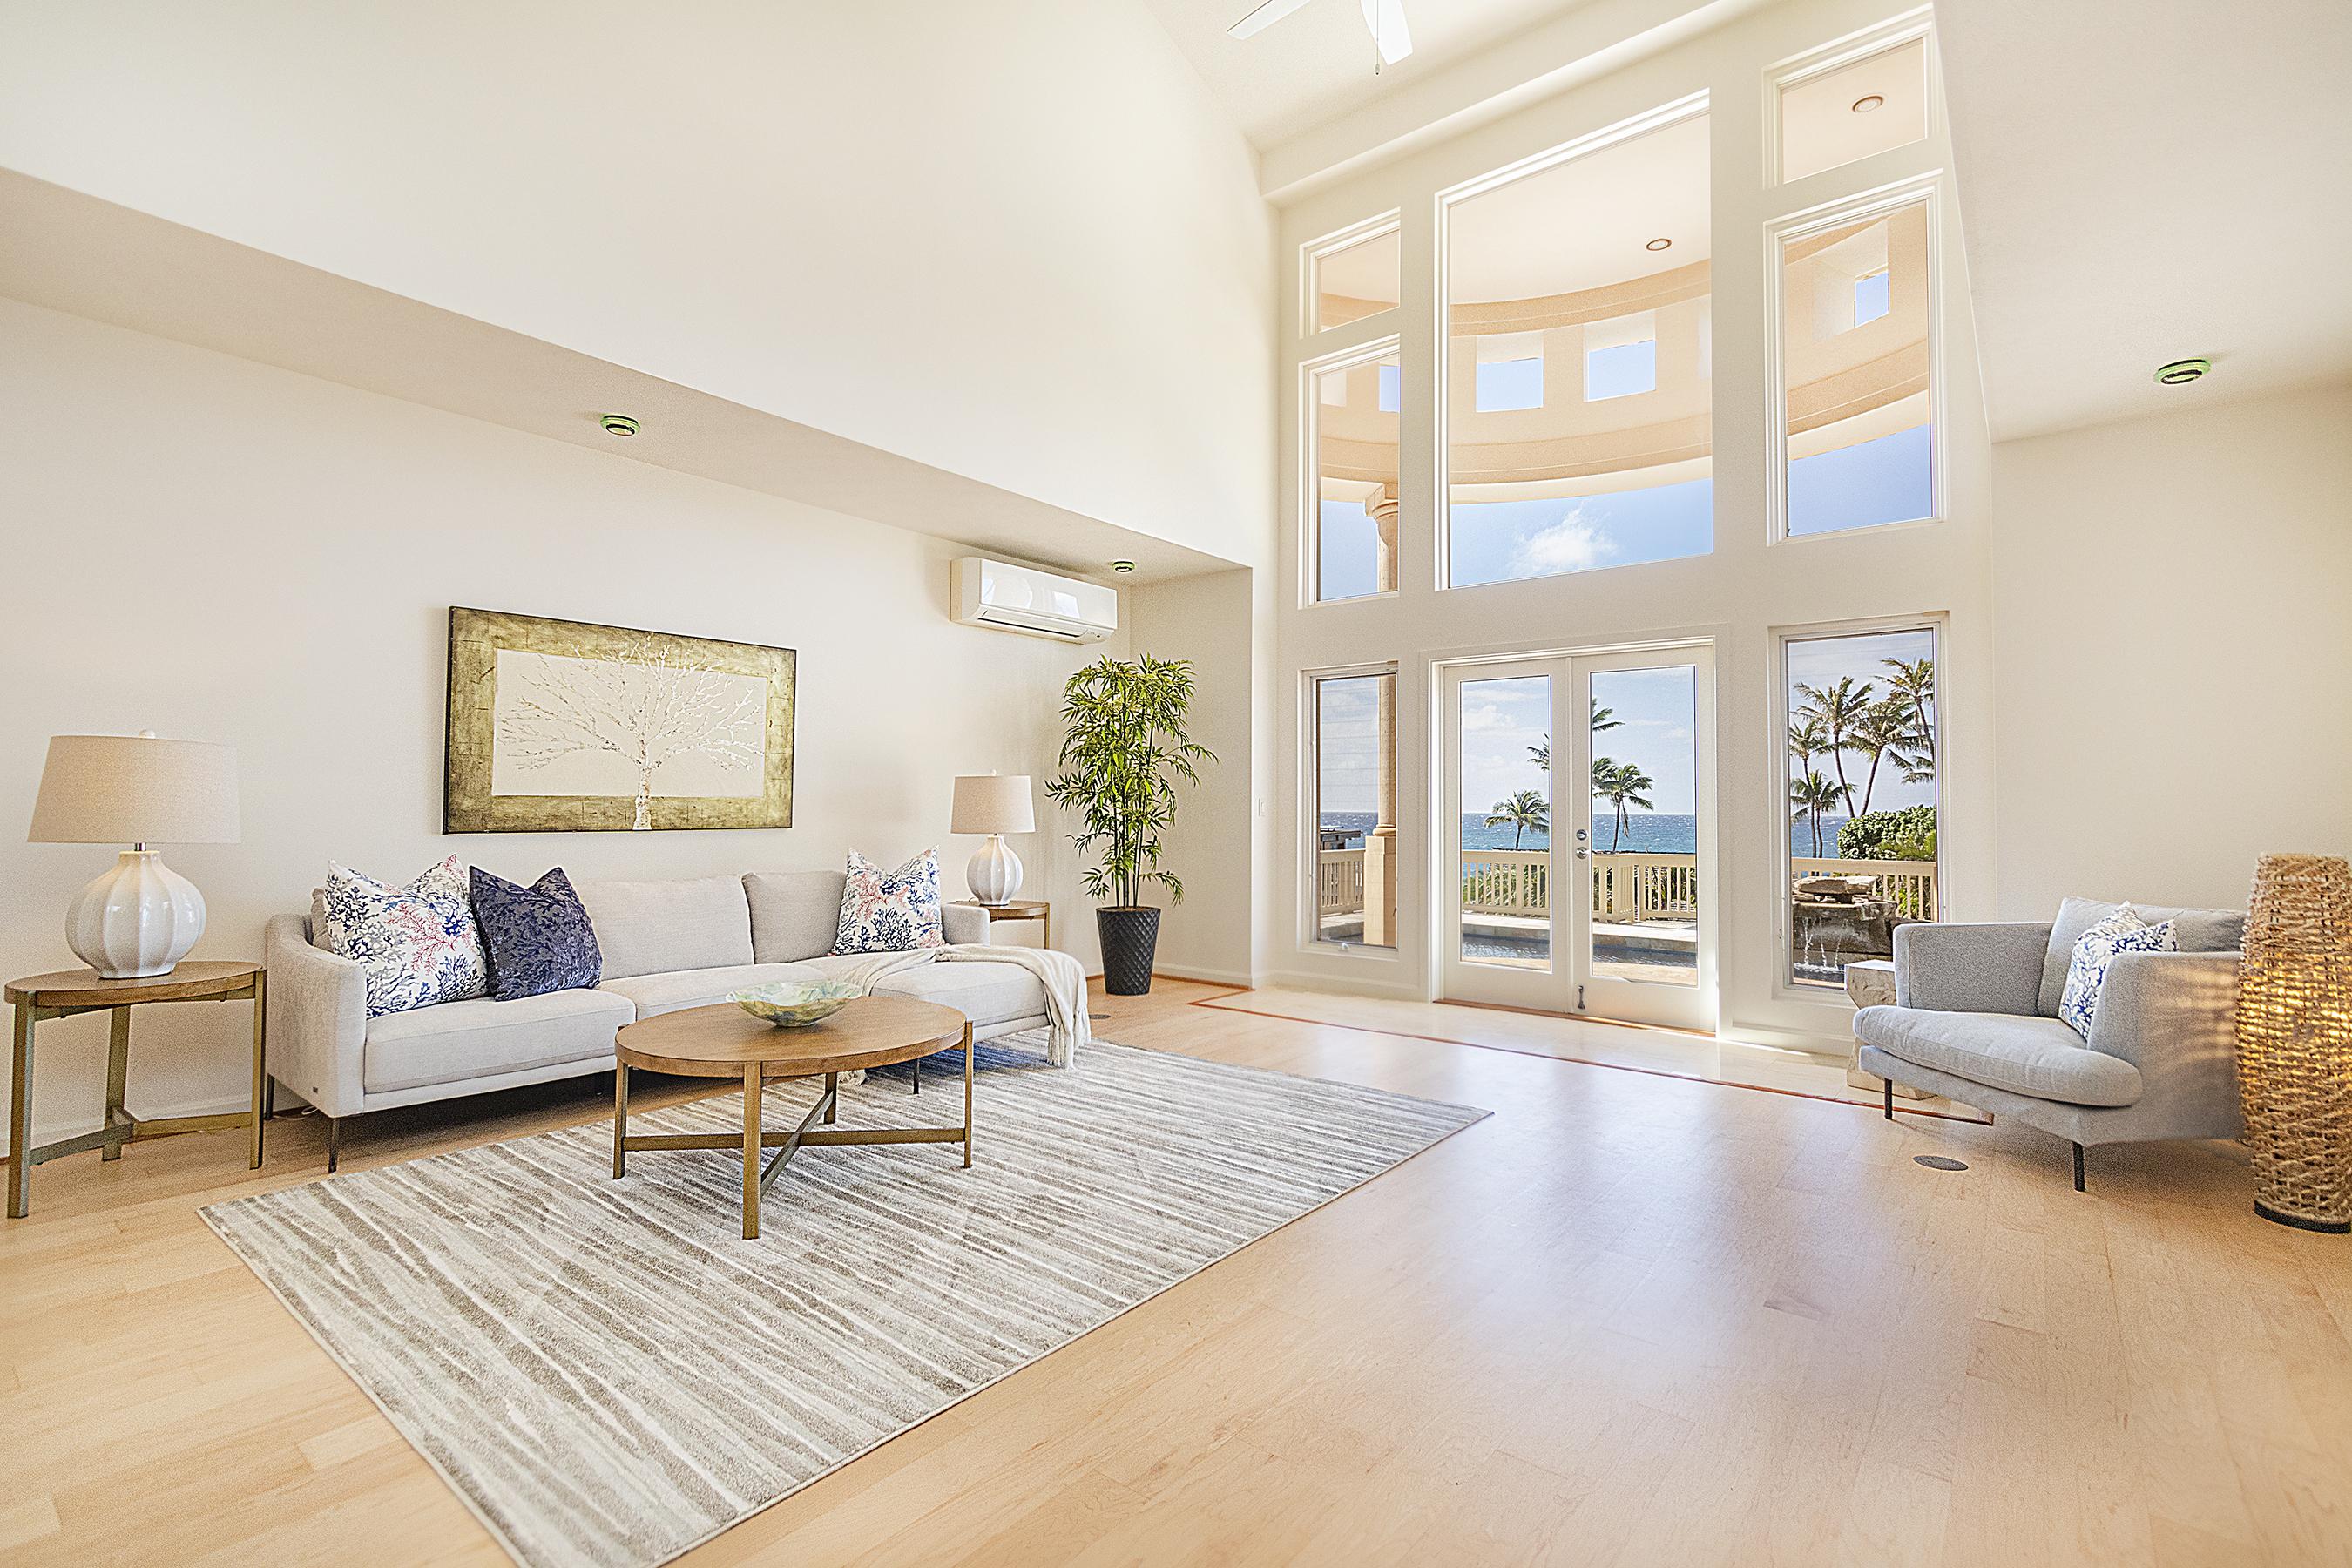 Living Room at 4323 Kaikoo Place, Honolulu, HI 96816